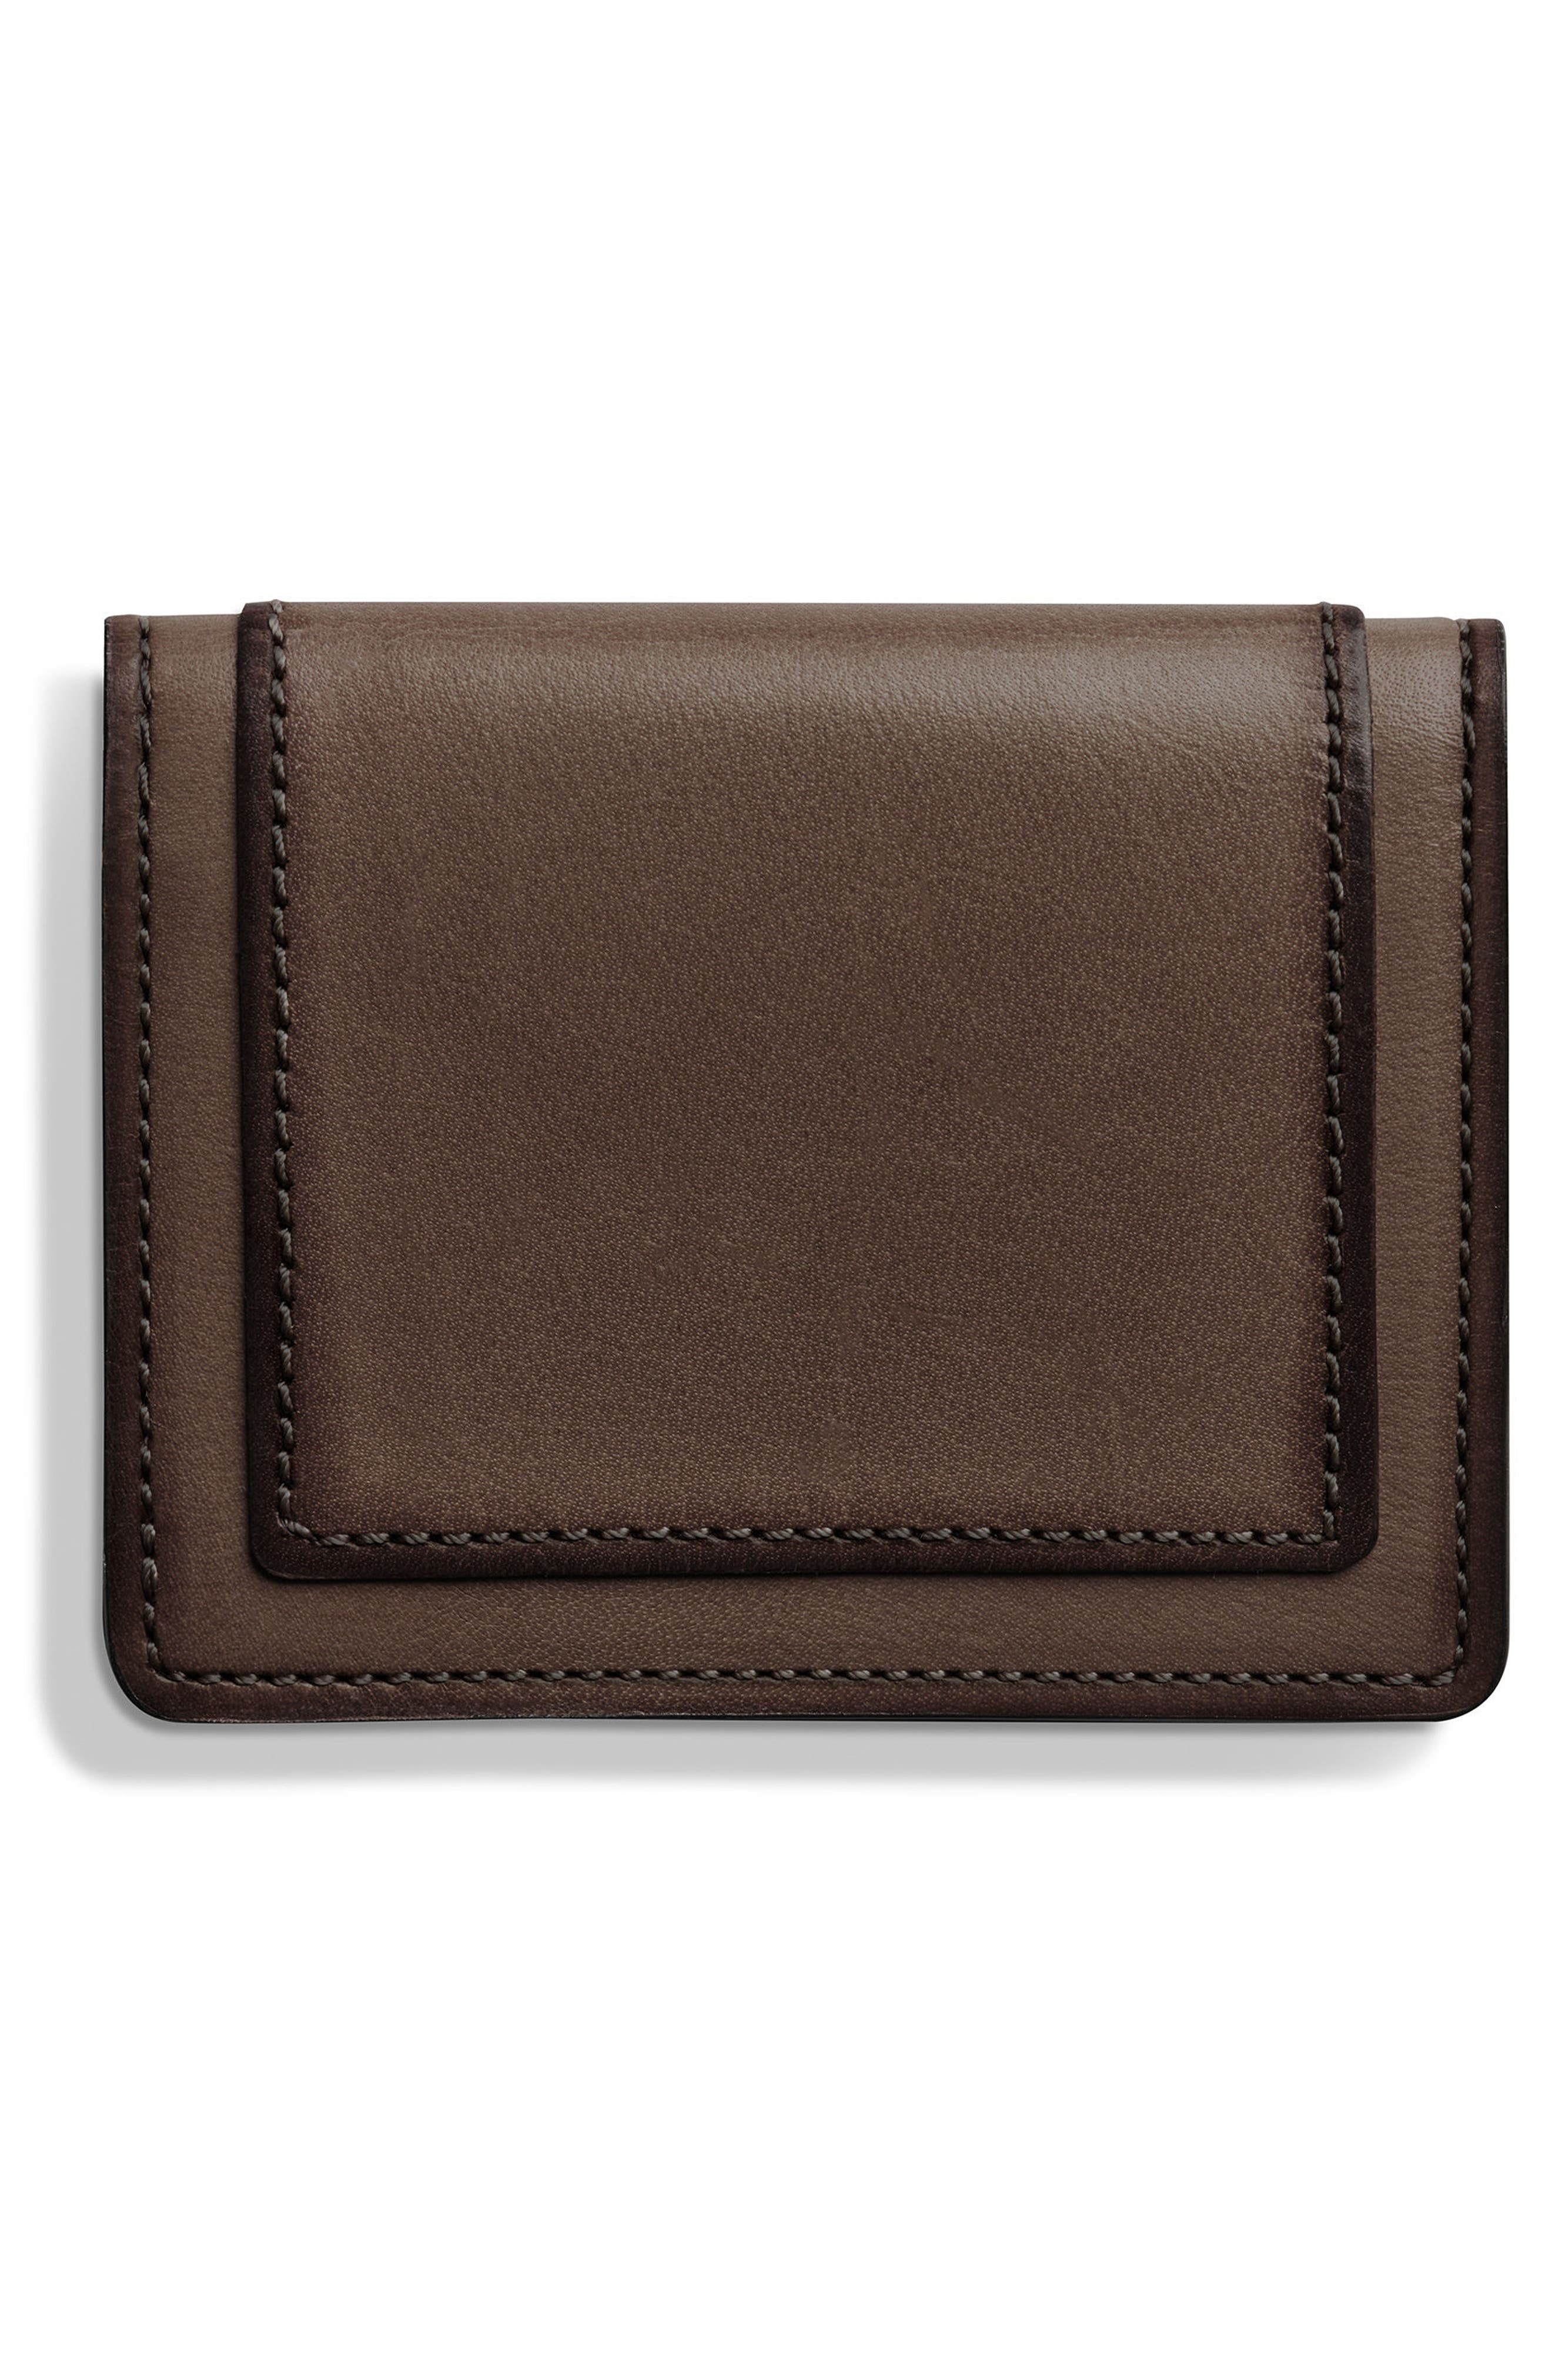 Outlaw Folding Card Case,                             Alternate thumbnail 3, color,                             Deep Brown